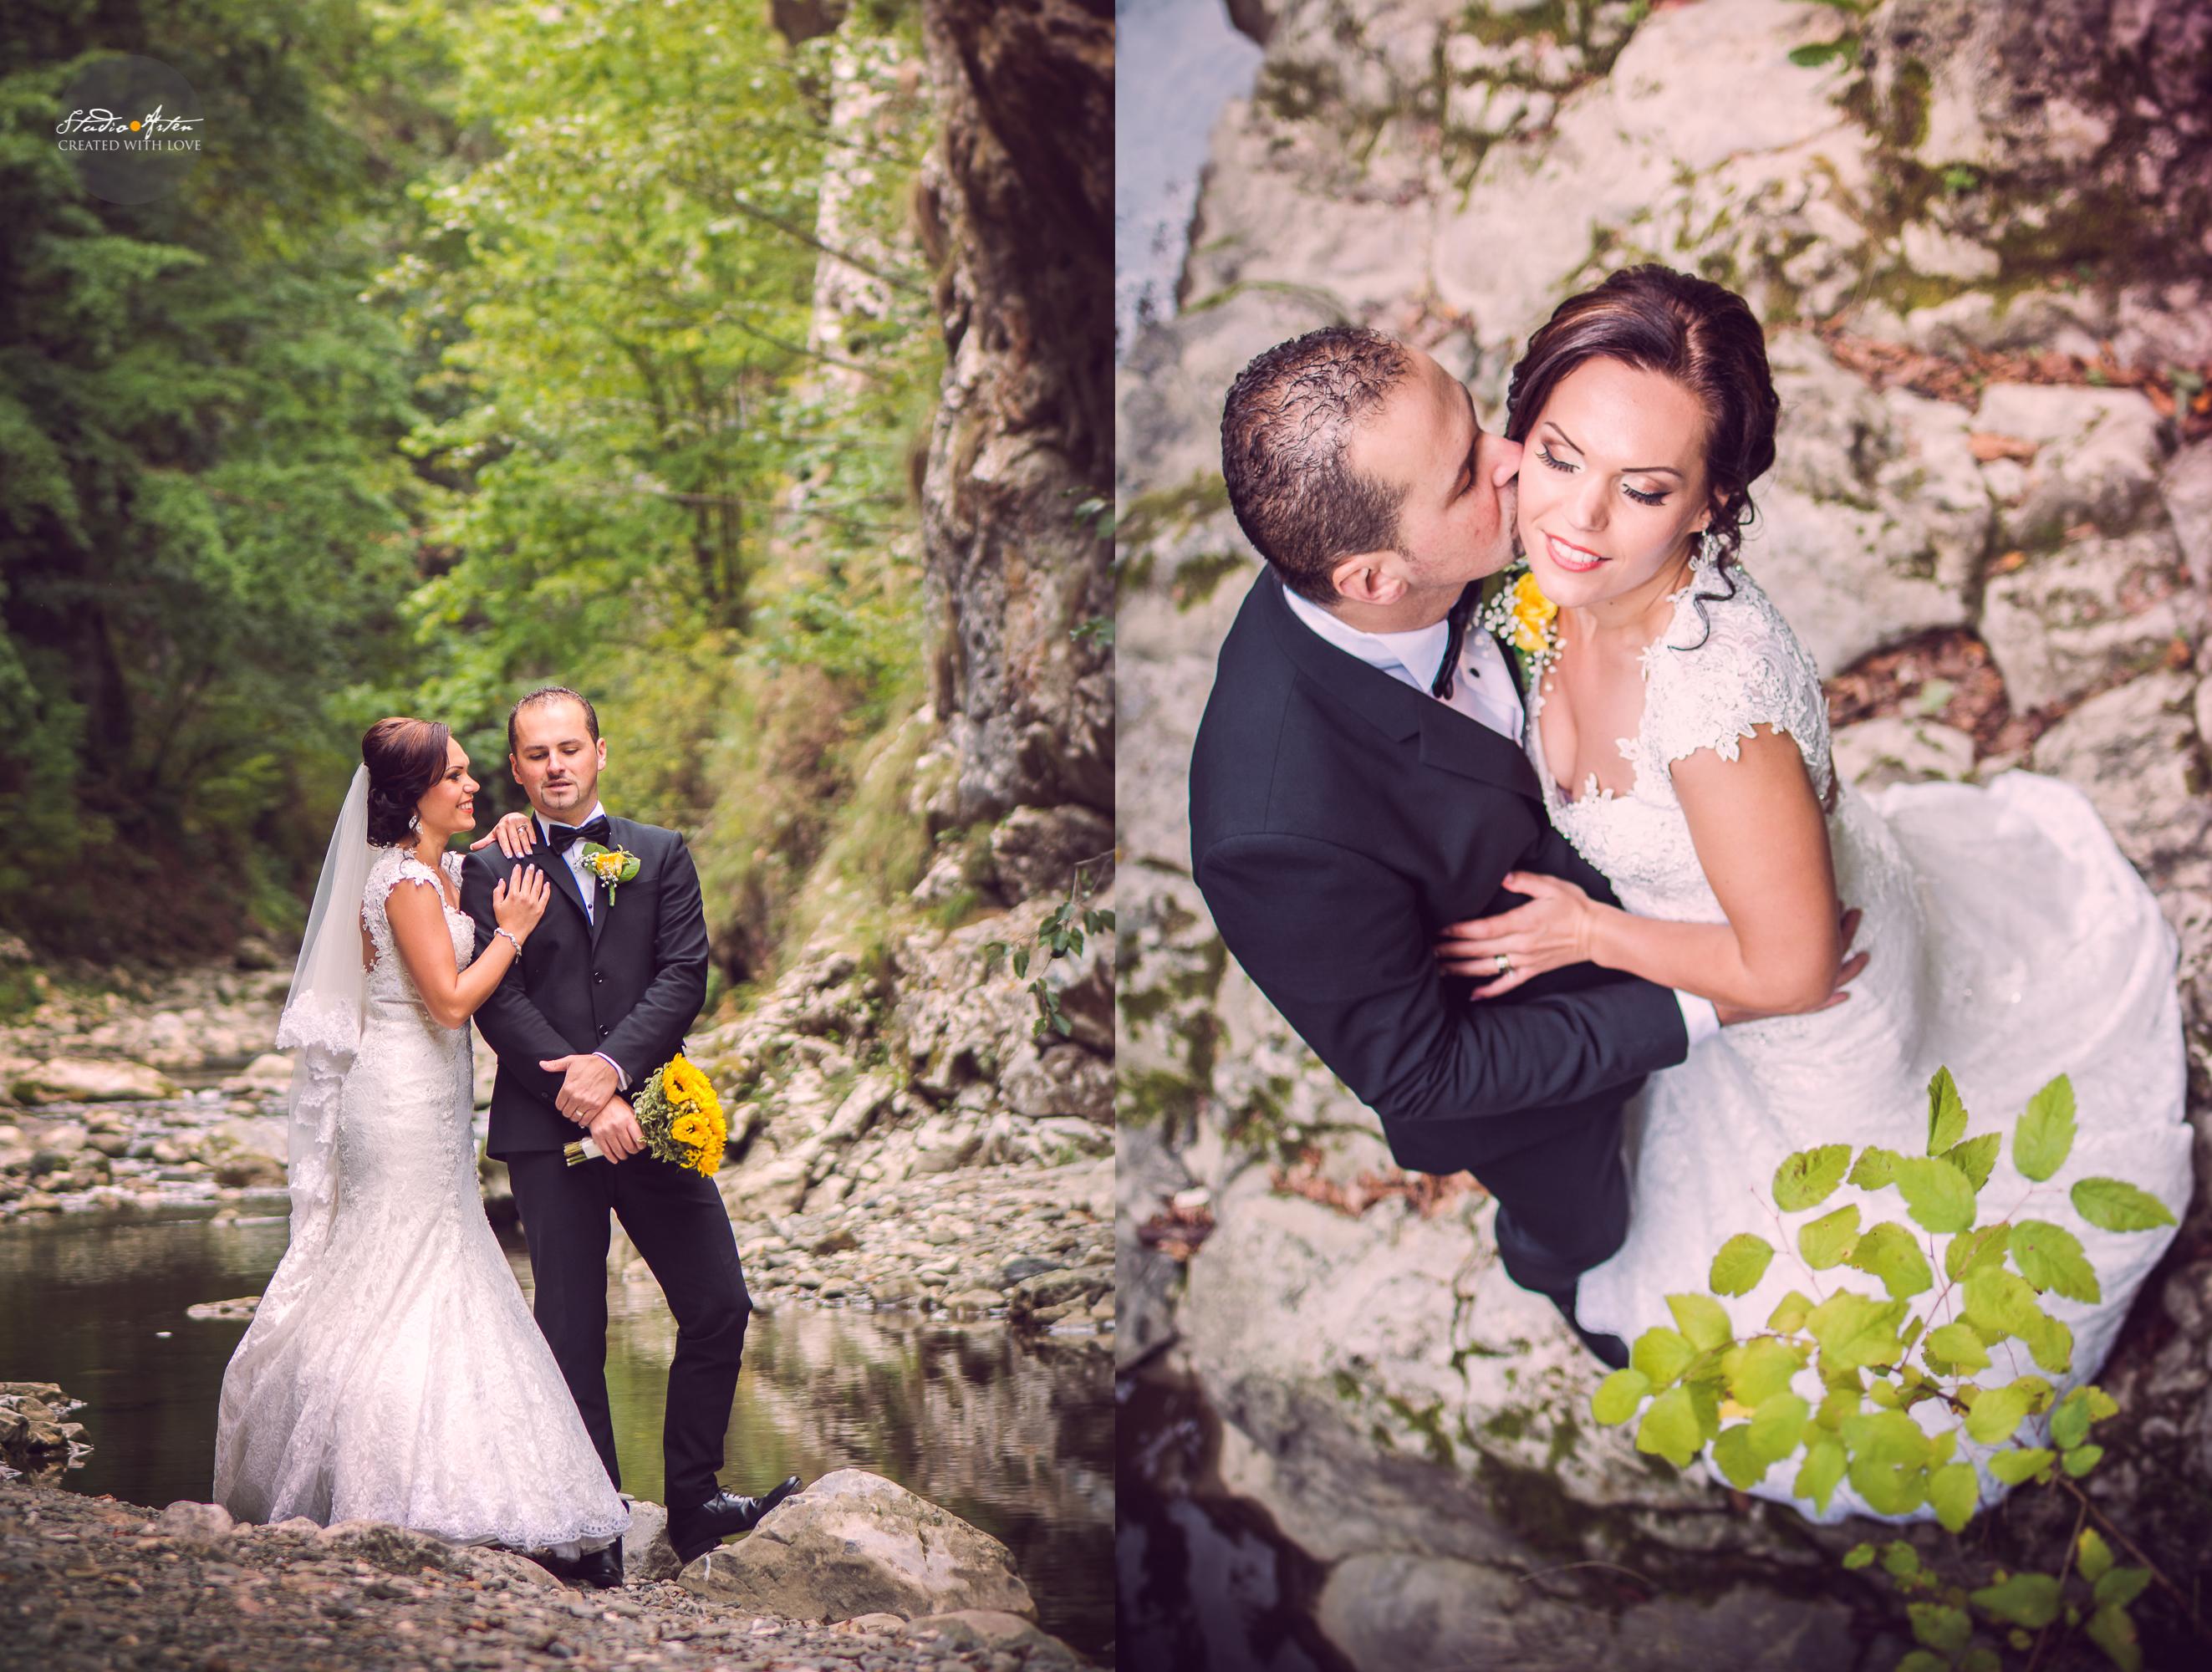 Fotografie nunta mures, sedinta foto nunta, fotografii nunta, fotografii profesionale Studio Arten, echipa foto video nunta